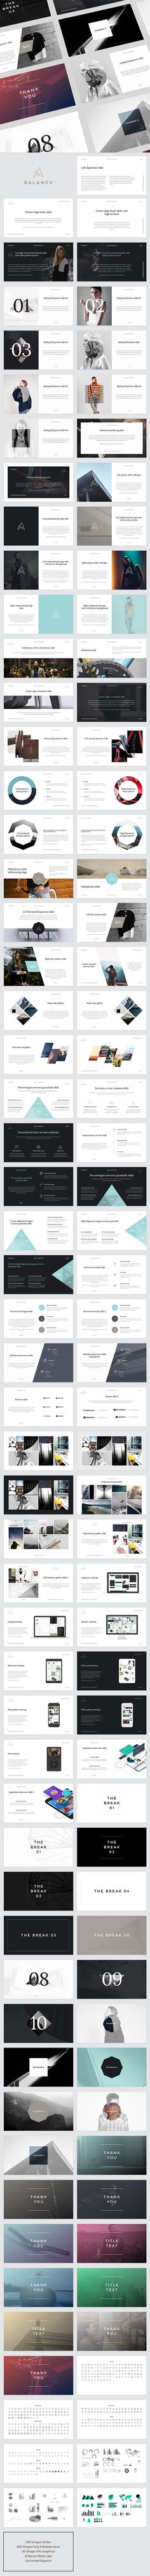 BALANCE PowerPoint Presentation by GoaShape. Price $20 #minimalistpresentationdesign #powerpointpresentationdesign #businesspowerpointtemplate